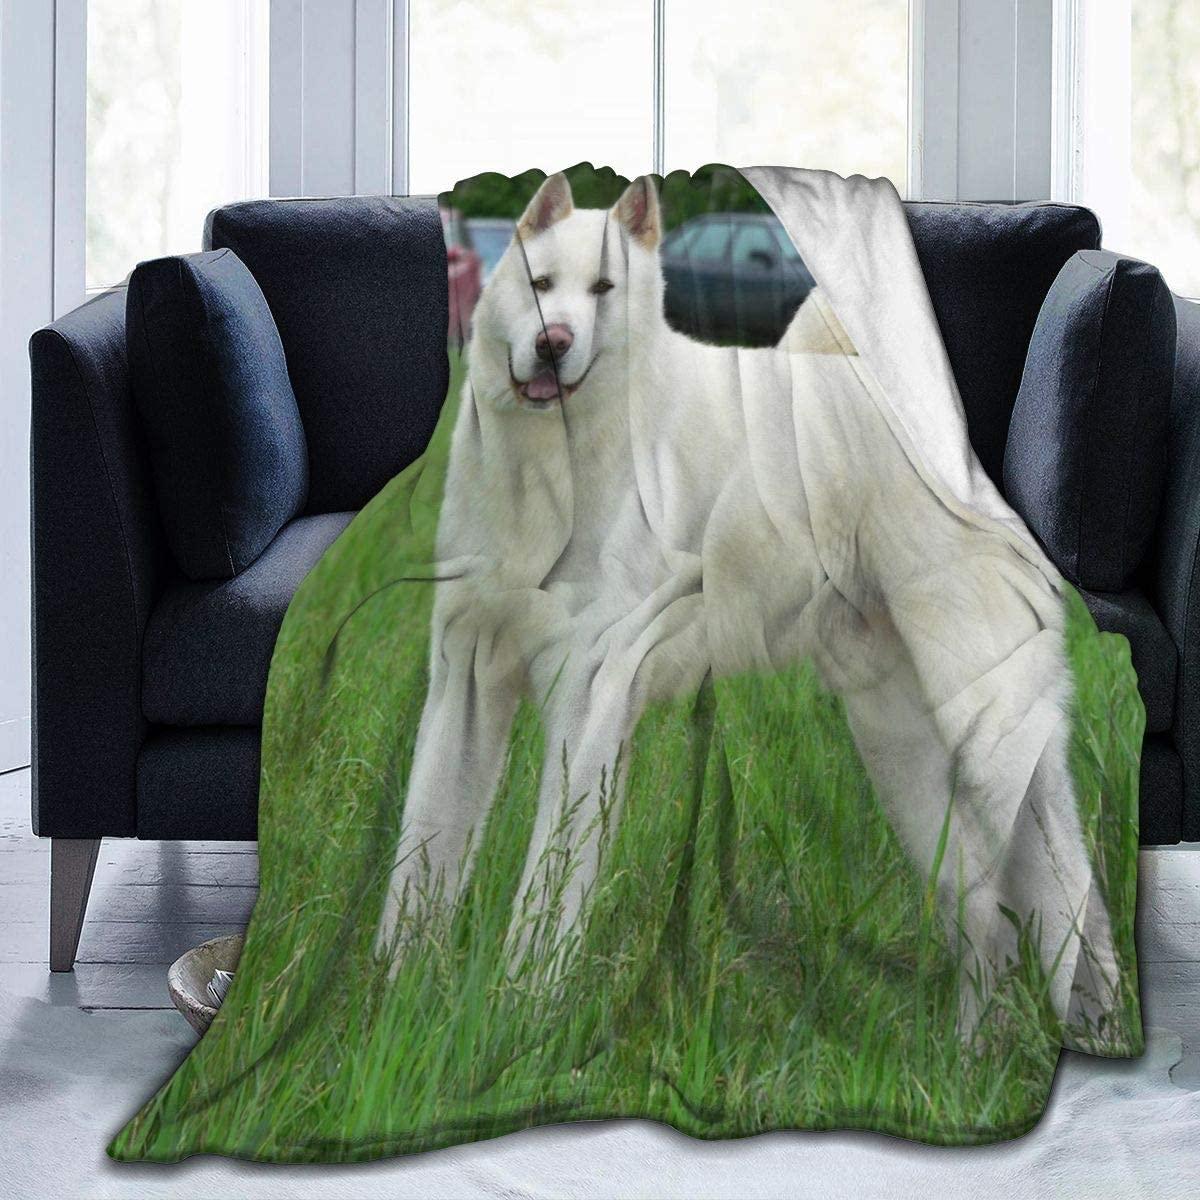 Micro Fleece Plush Soft Baby Blanket Japanese Akita White Dog Fluffy Warm Toddler Bed/Crib Blanket Lightweight Flannel Daycare Nap Kids Sleeping Tummy Time Throw Blanket Girls Boy Clearance